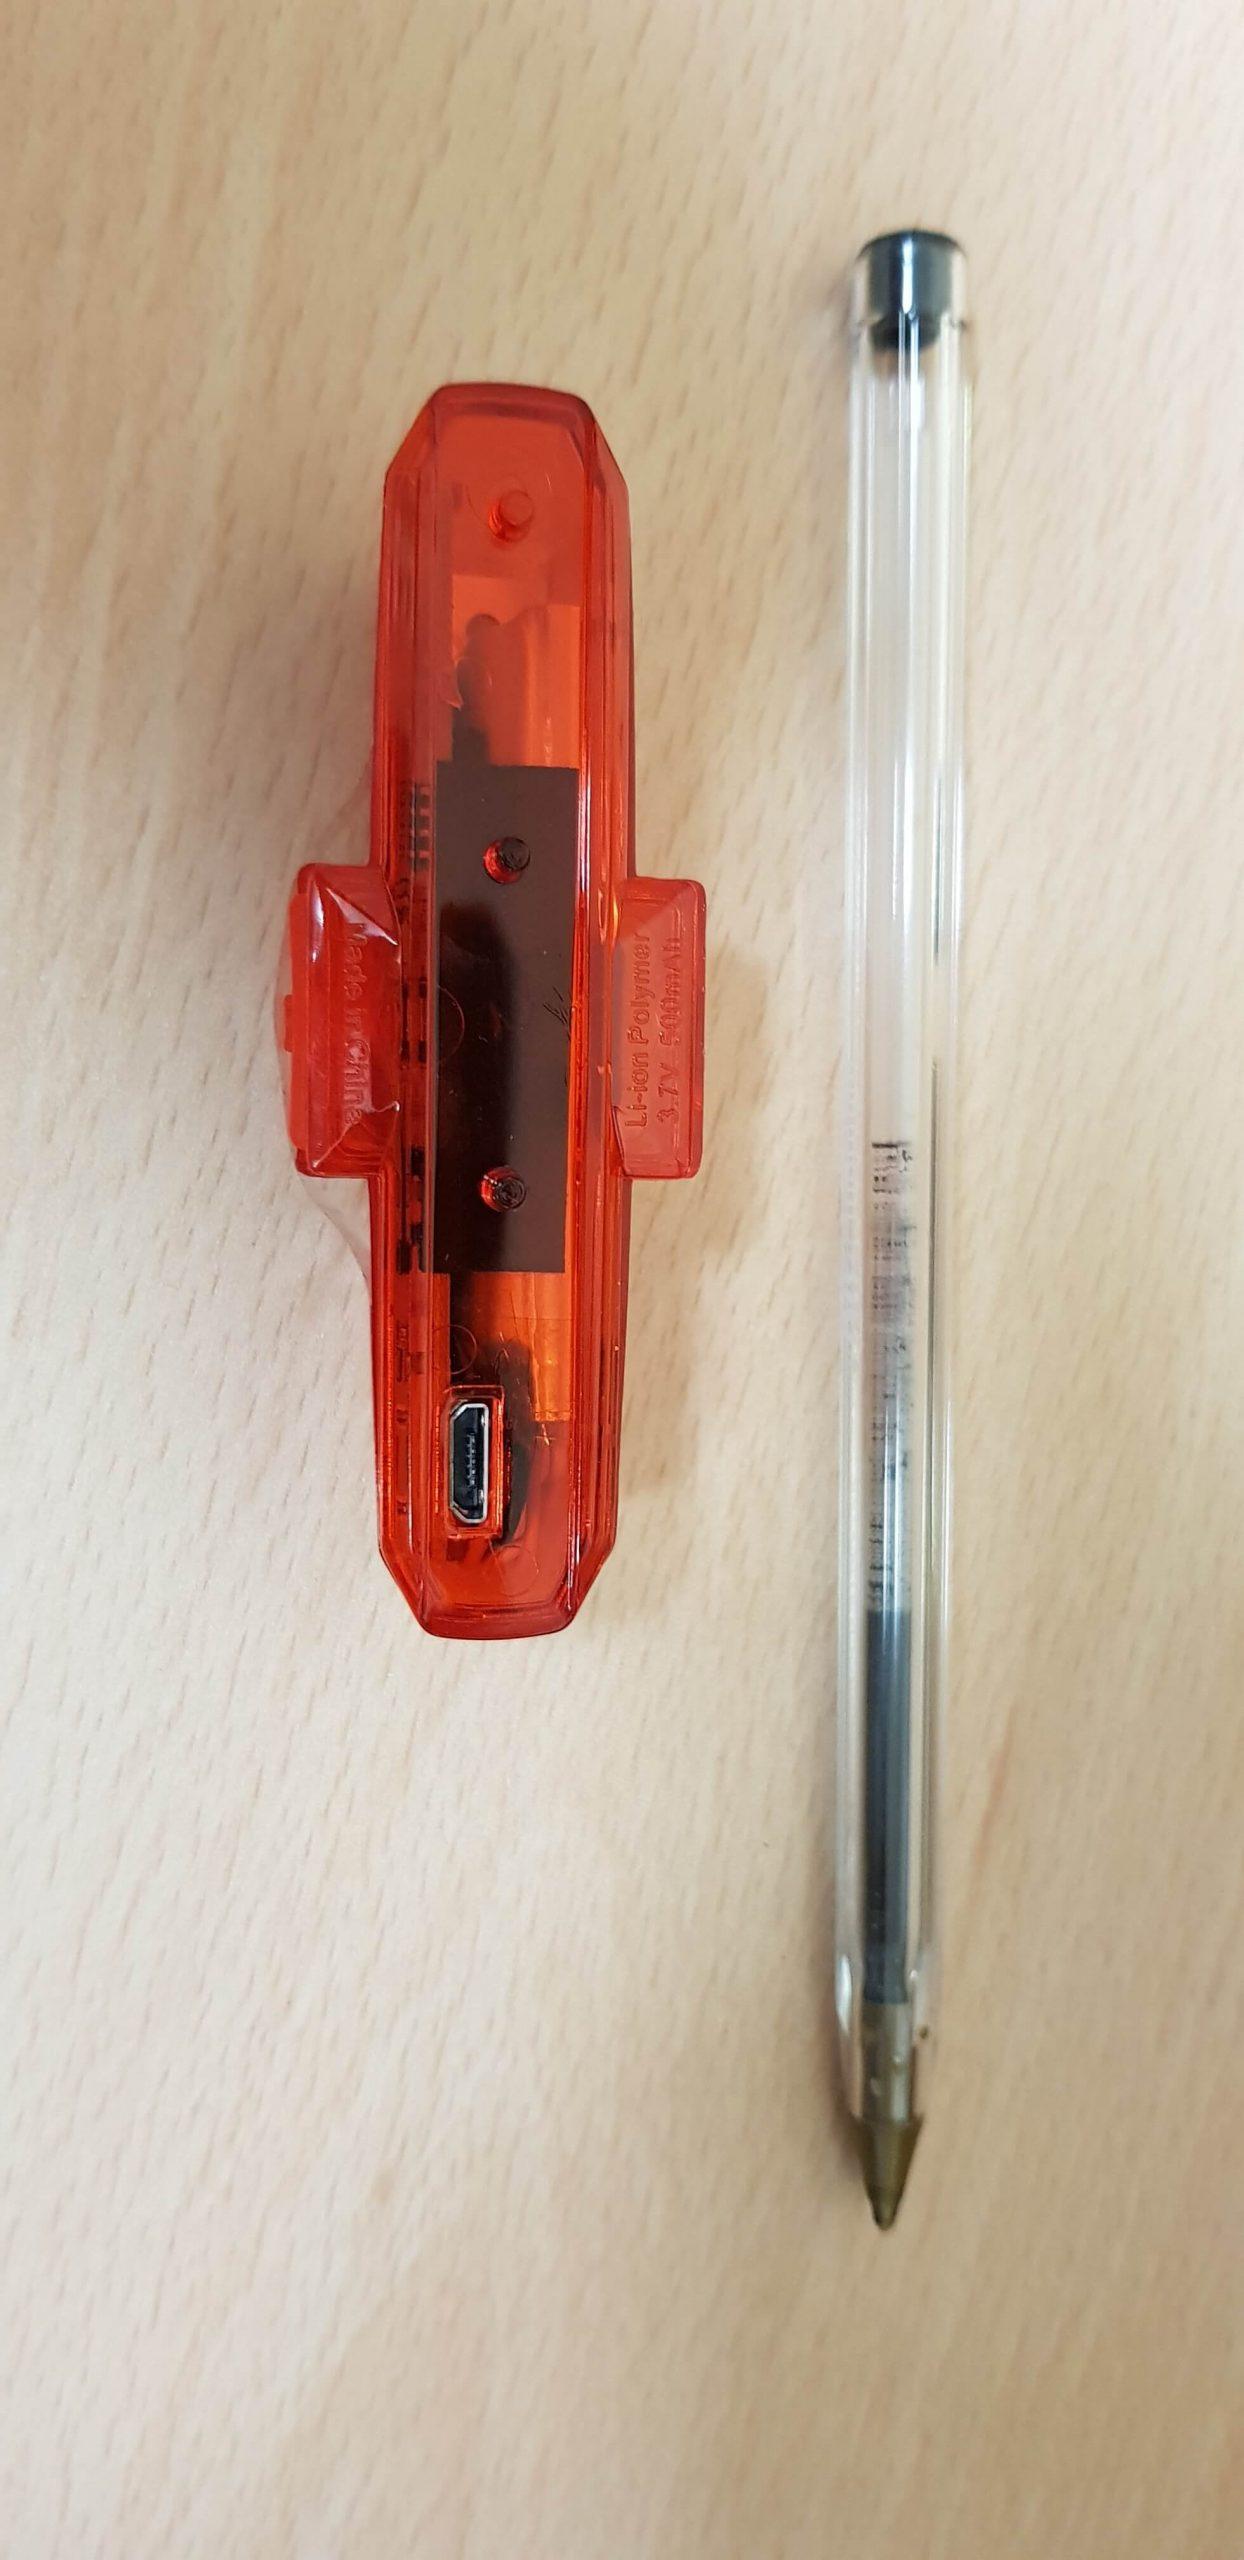 Luce posteriore led ApaceVision GuardG3X - dimensioni posteriore